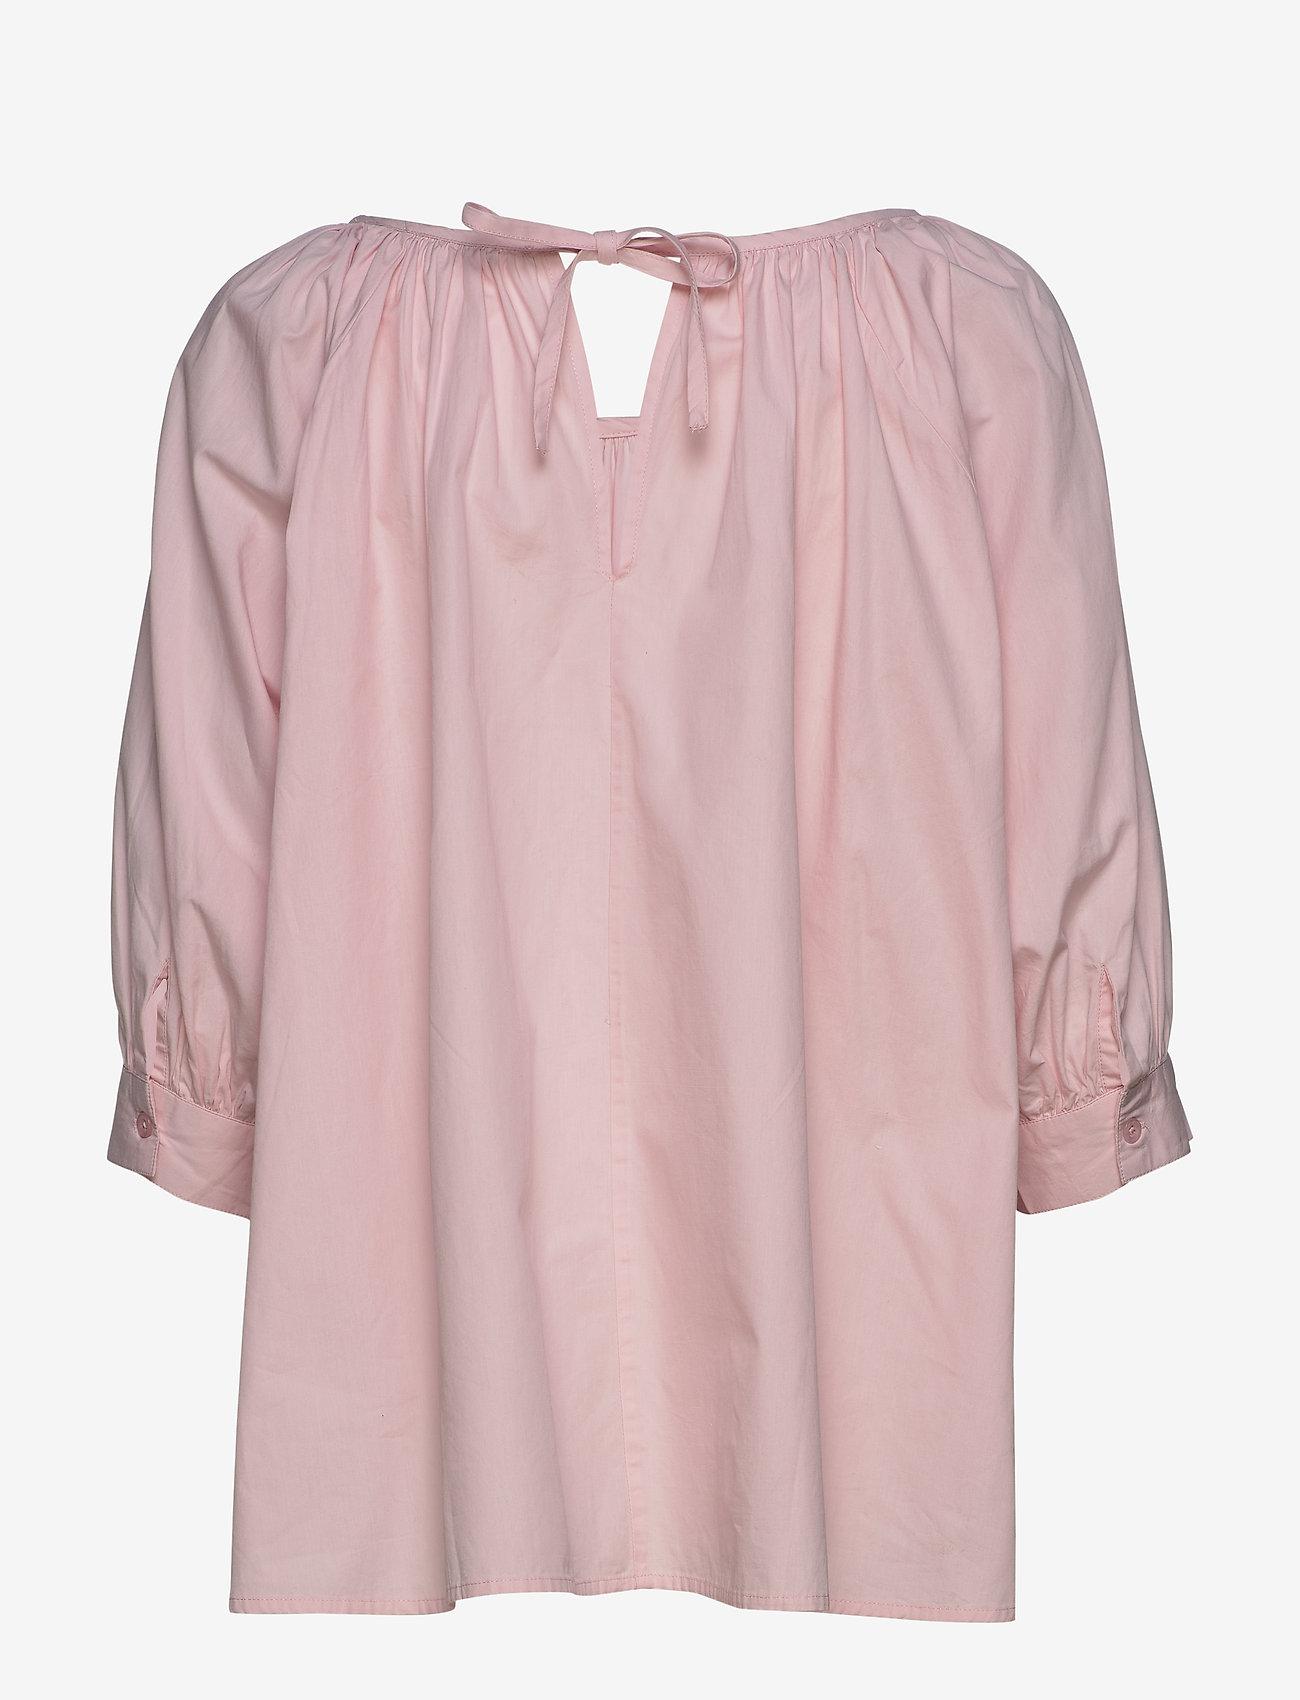 Esmira Blouse (Barely Pink) - Lovechild 1979 iI33Ep